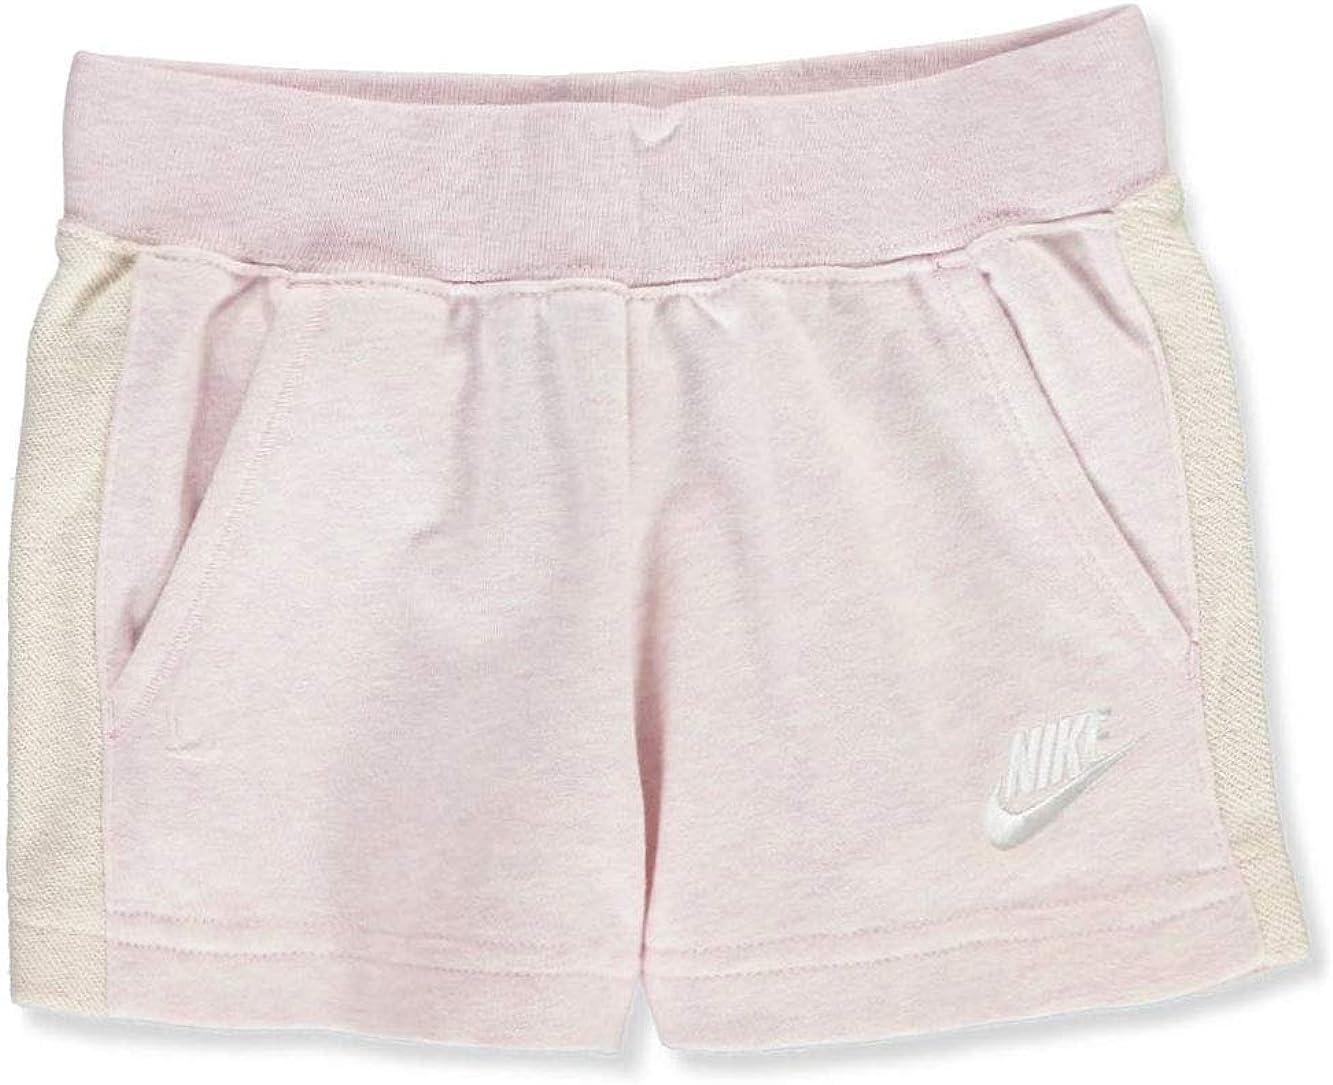 Nike Toddler Girls' Knit Shorts Pink Foam Heather Size 4T